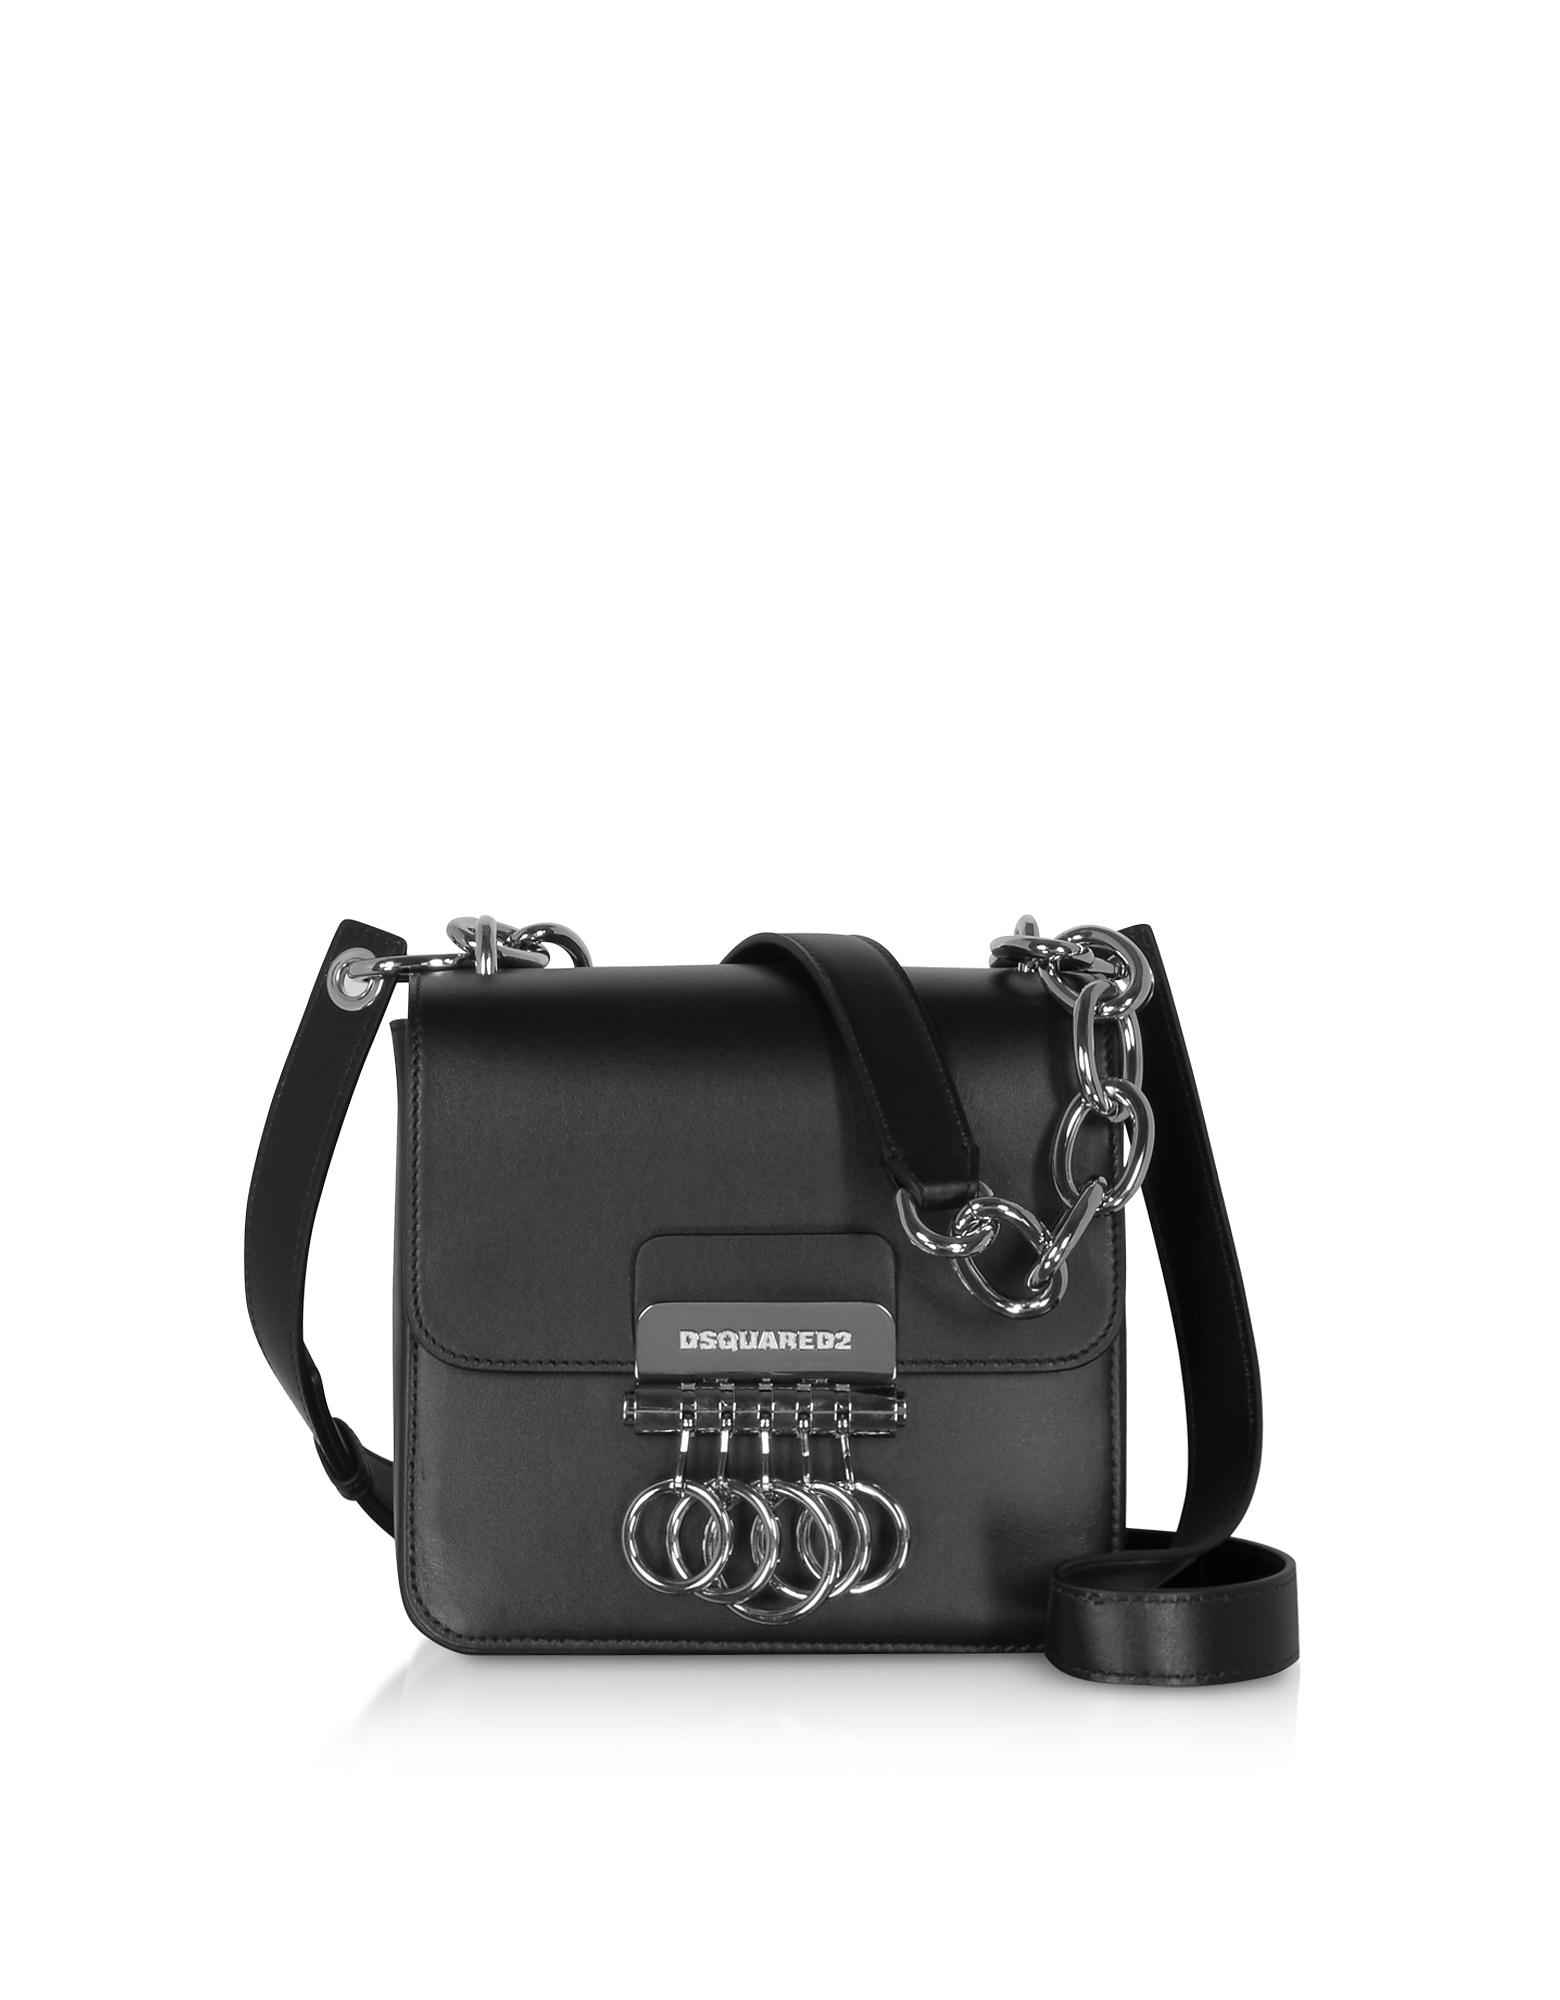 DSquared2 Designer Handbags, Black Leather Key Crossbody Bag